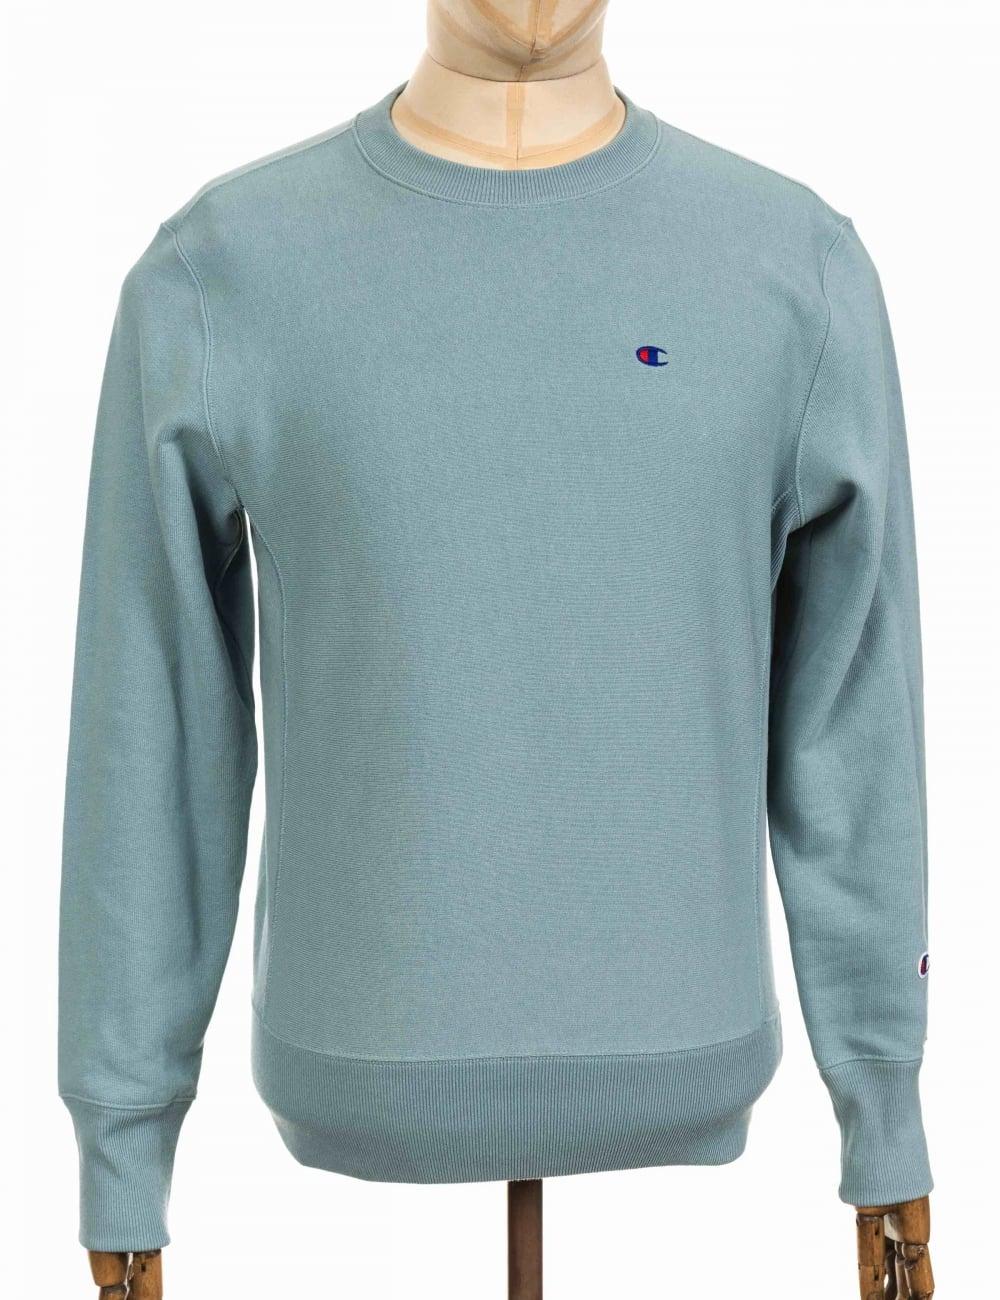 Blue Crewneck Cgr Sweatshirt Cgr Crewneck Blue Sweatshirt Crewneck R54Aj3L